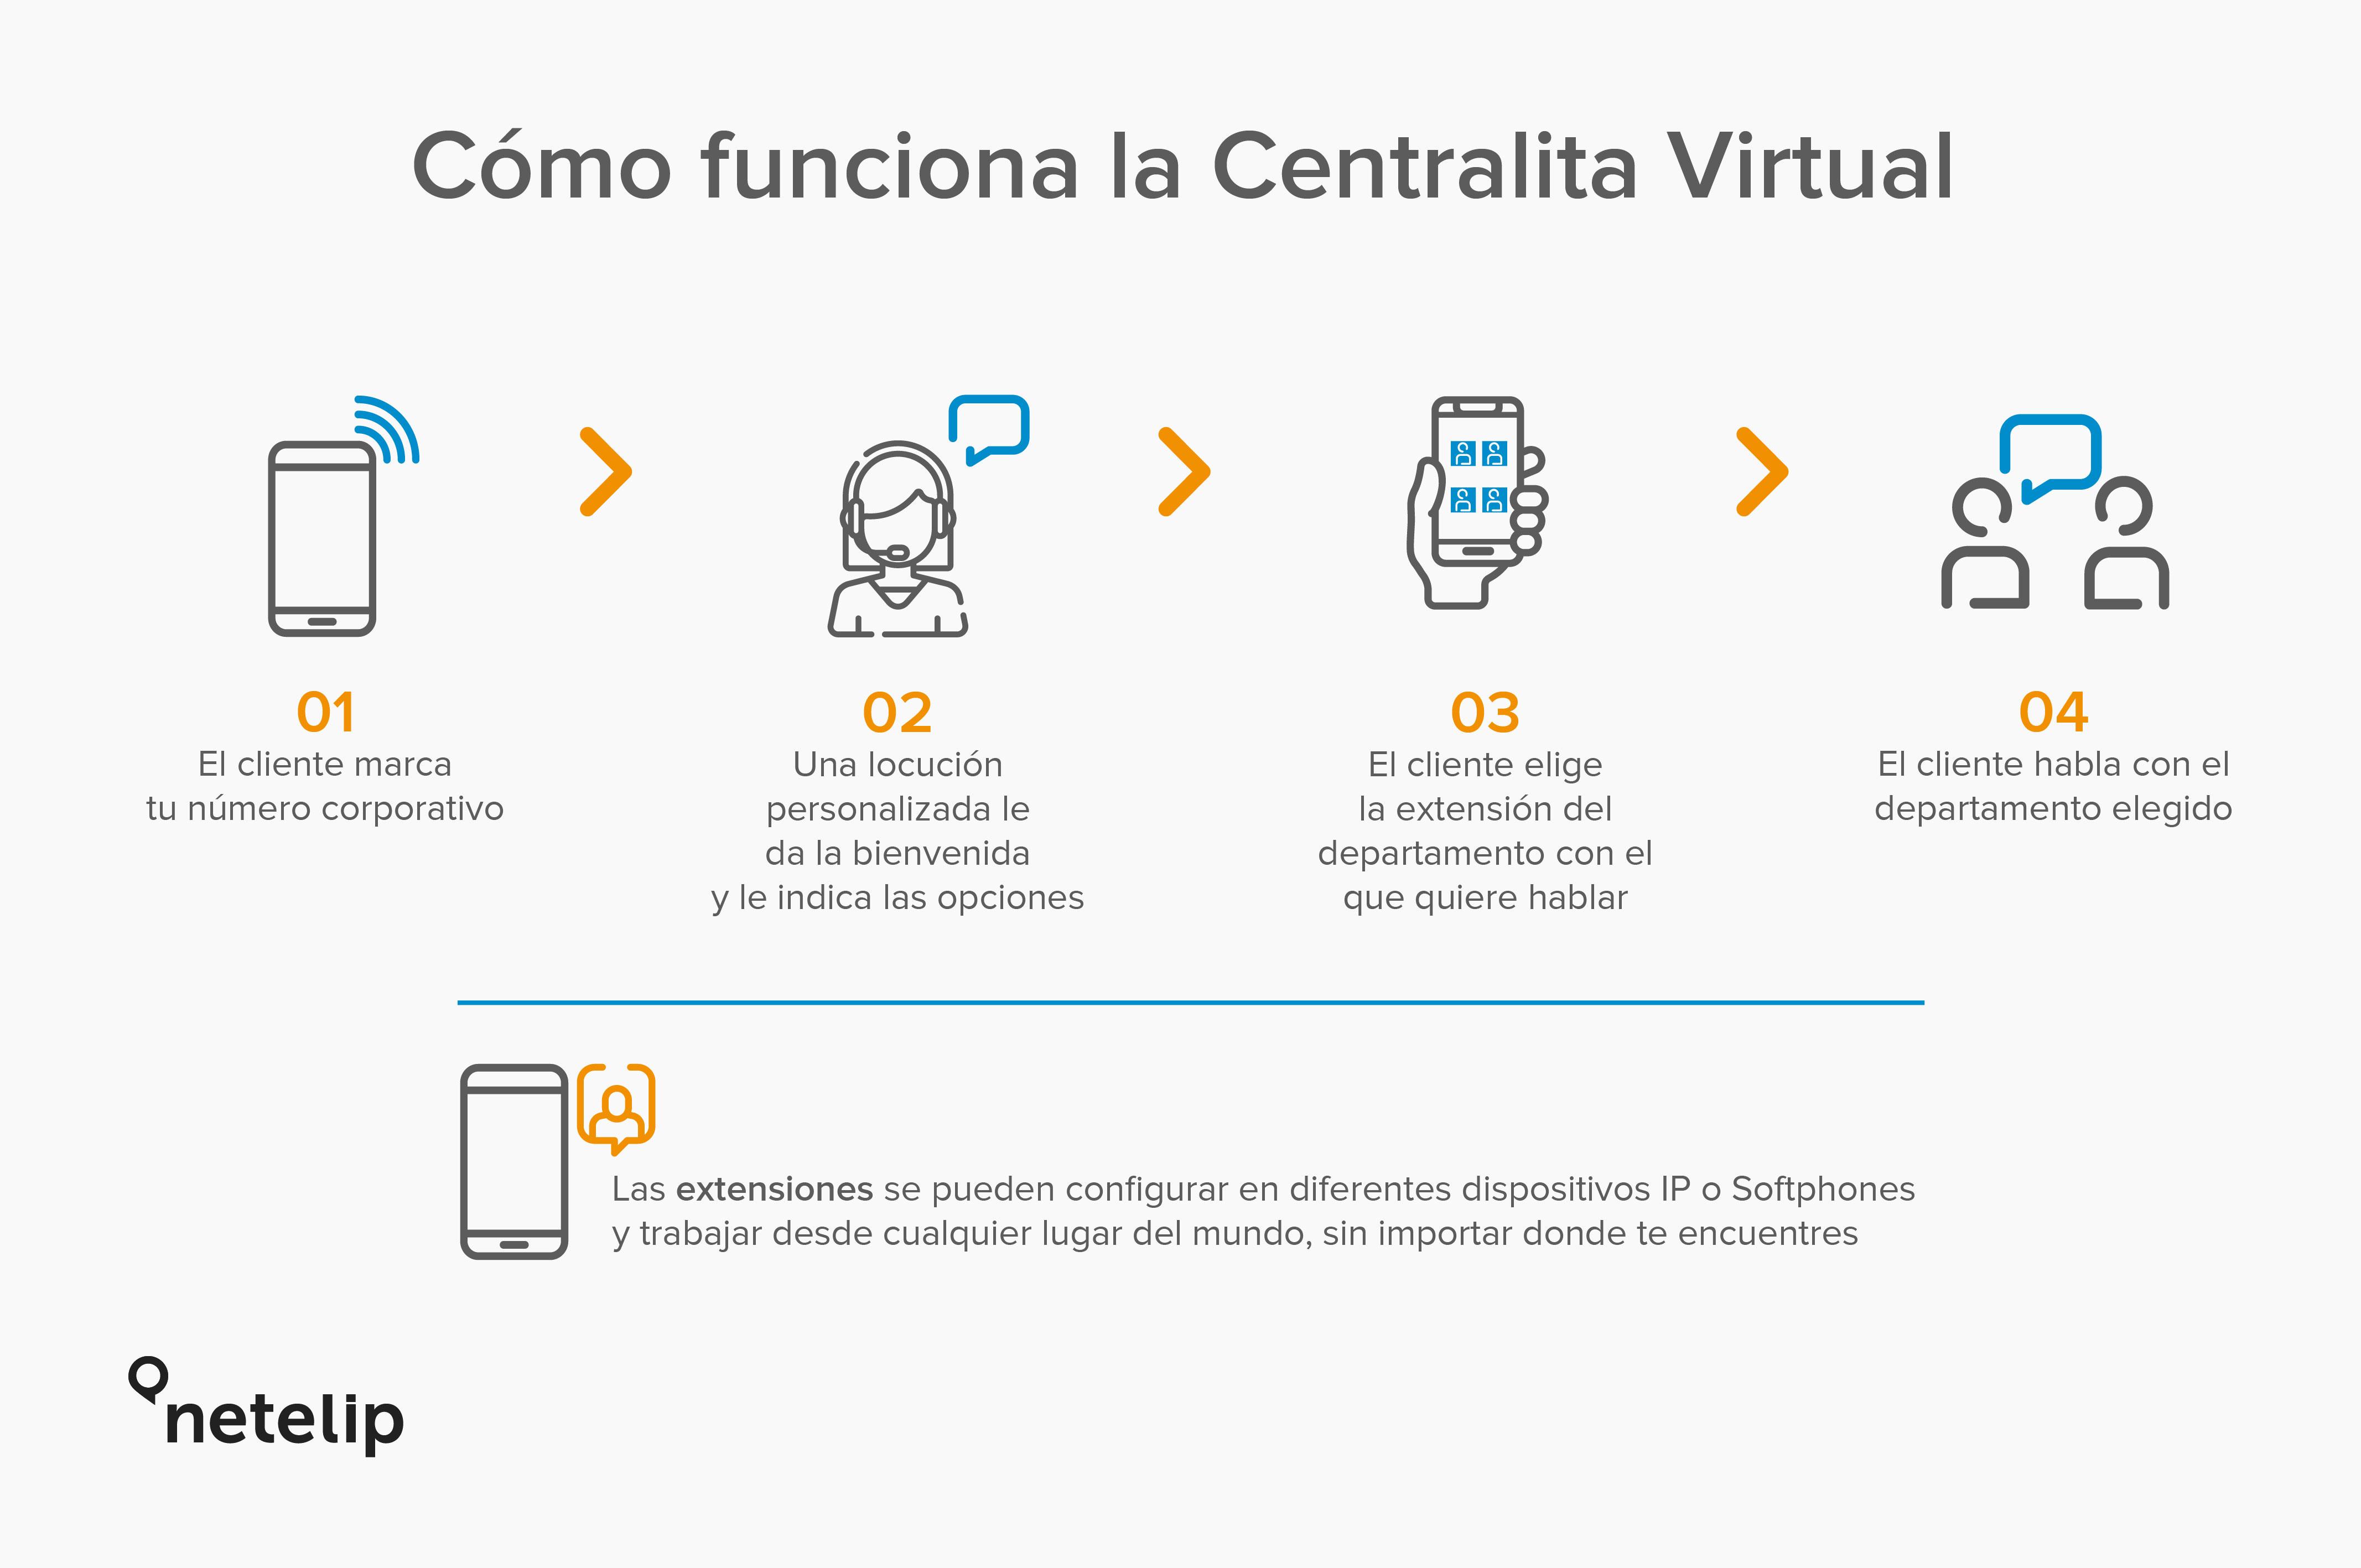 Funcionamiento de la Centralita Virtual de netelip